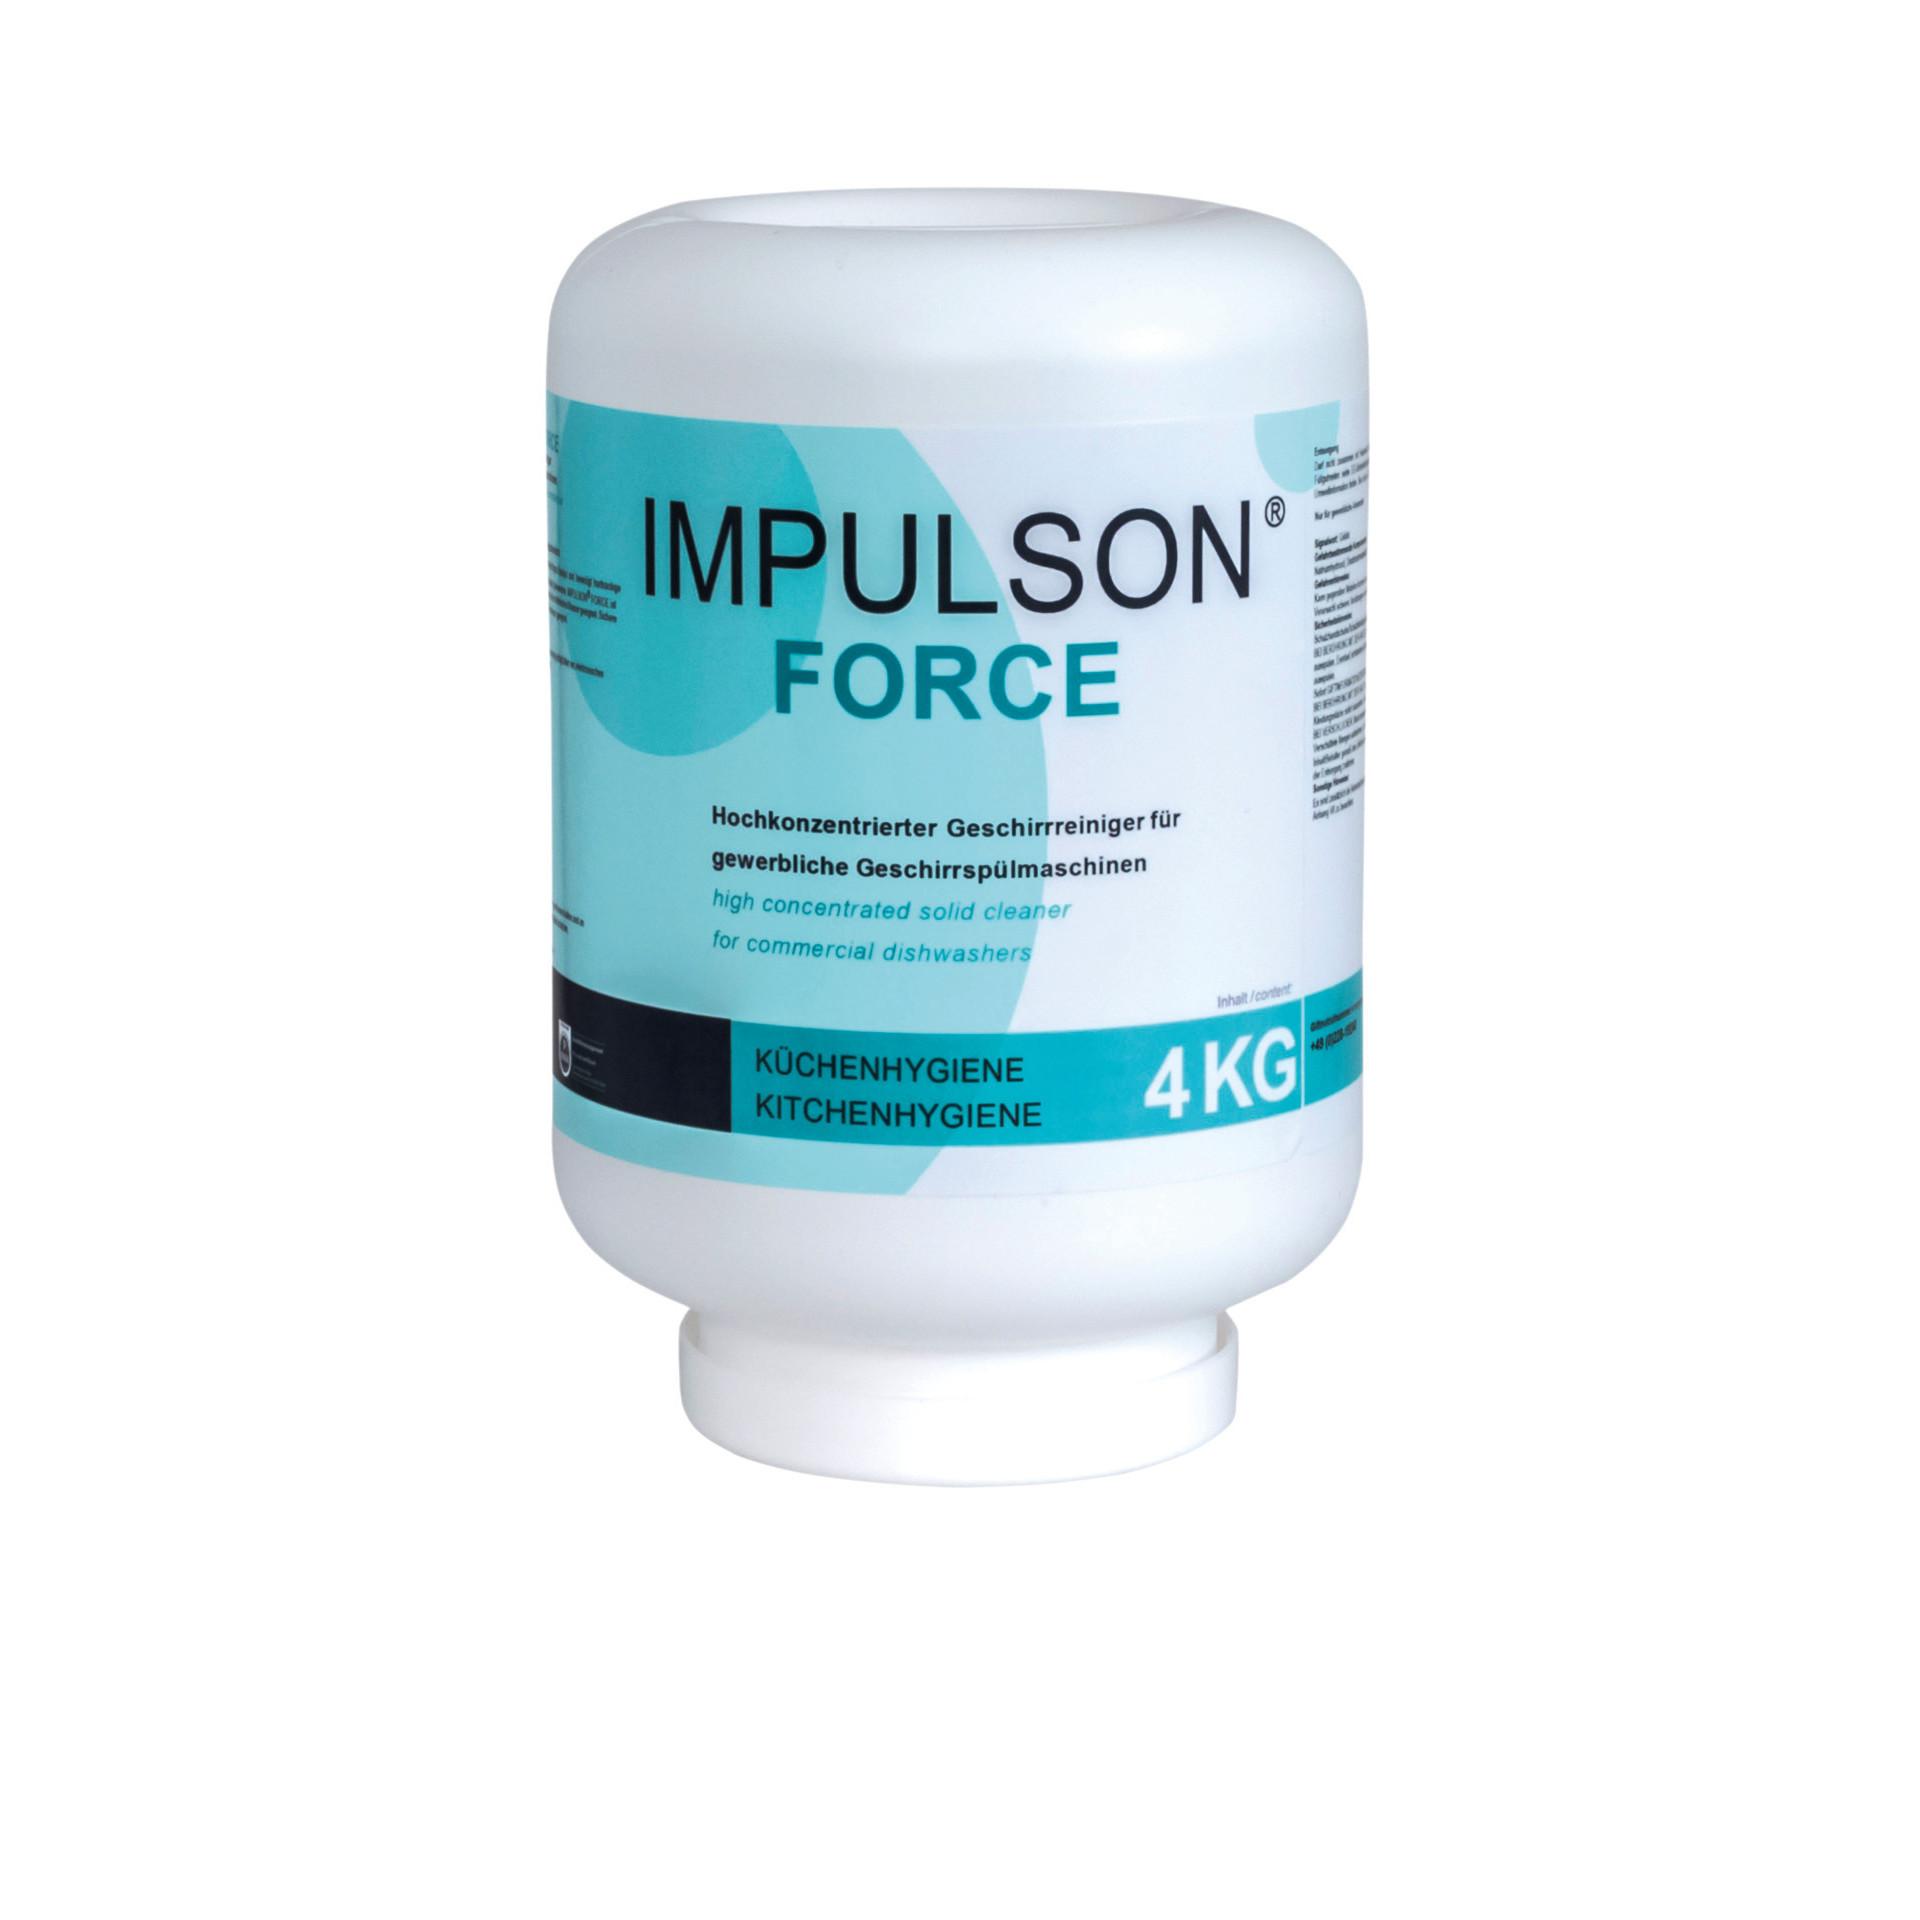 Impulson force 4 x 4,00 kg